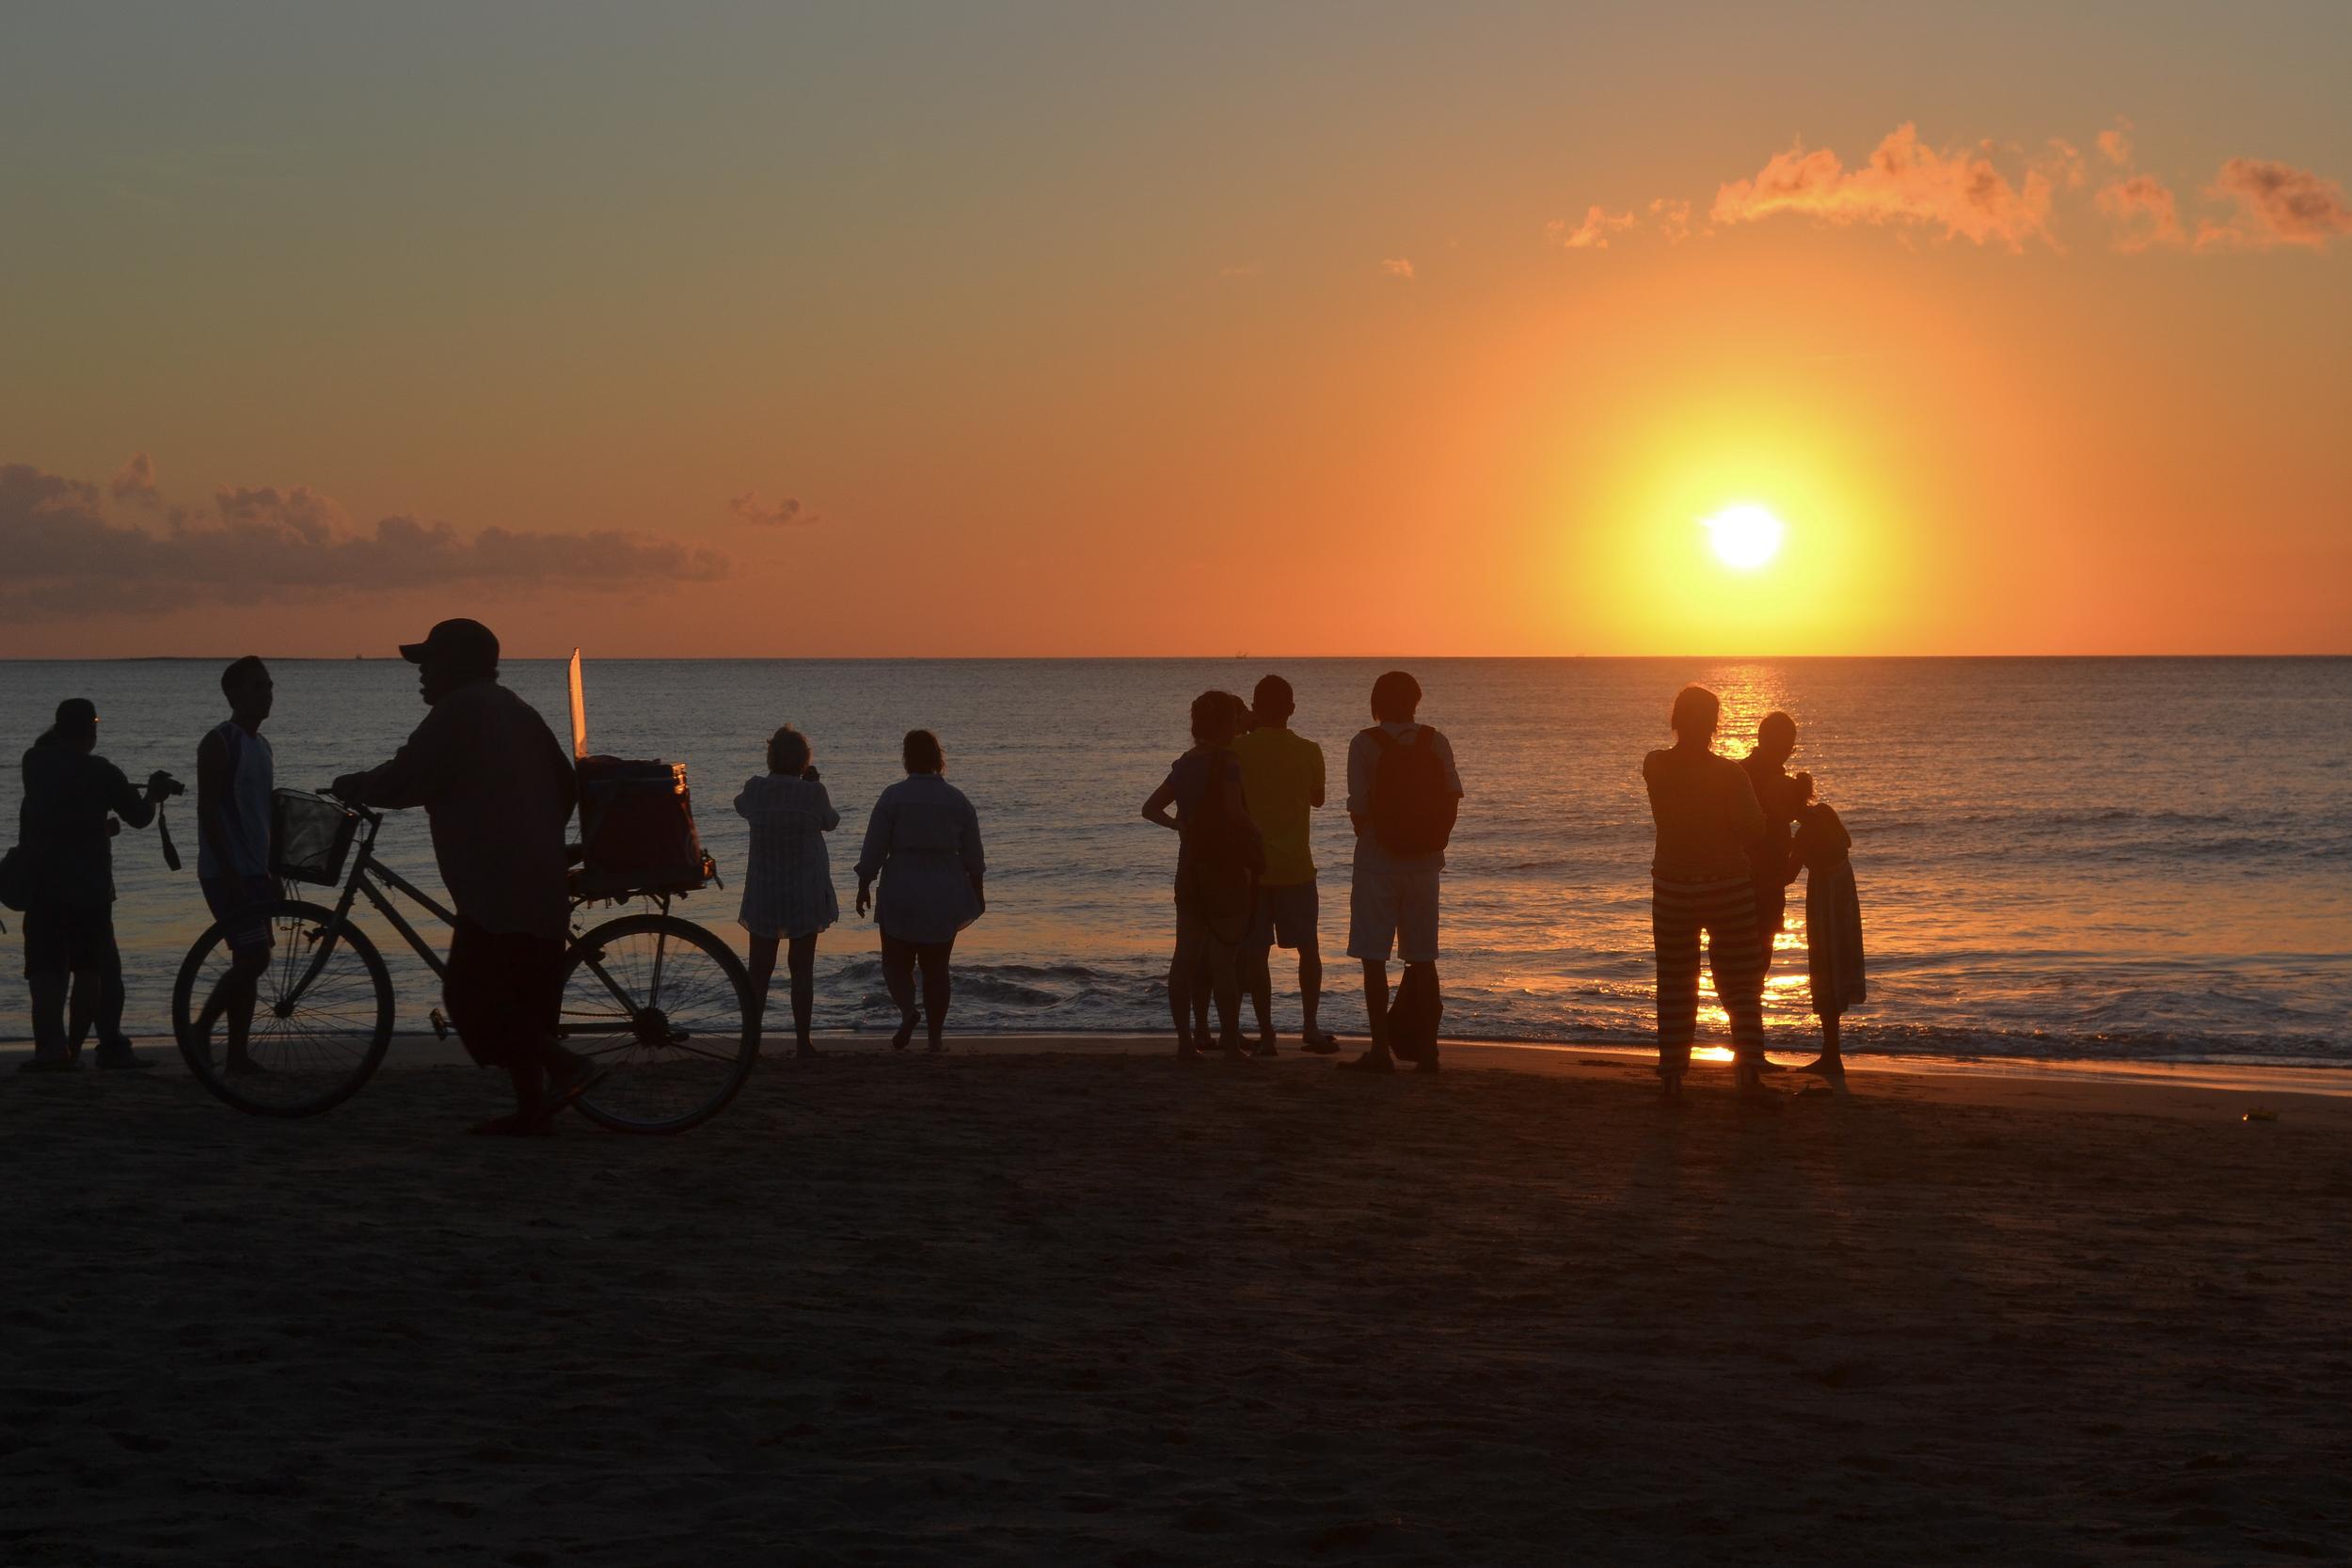 bali jimbaran bay sunset voyage collective beach